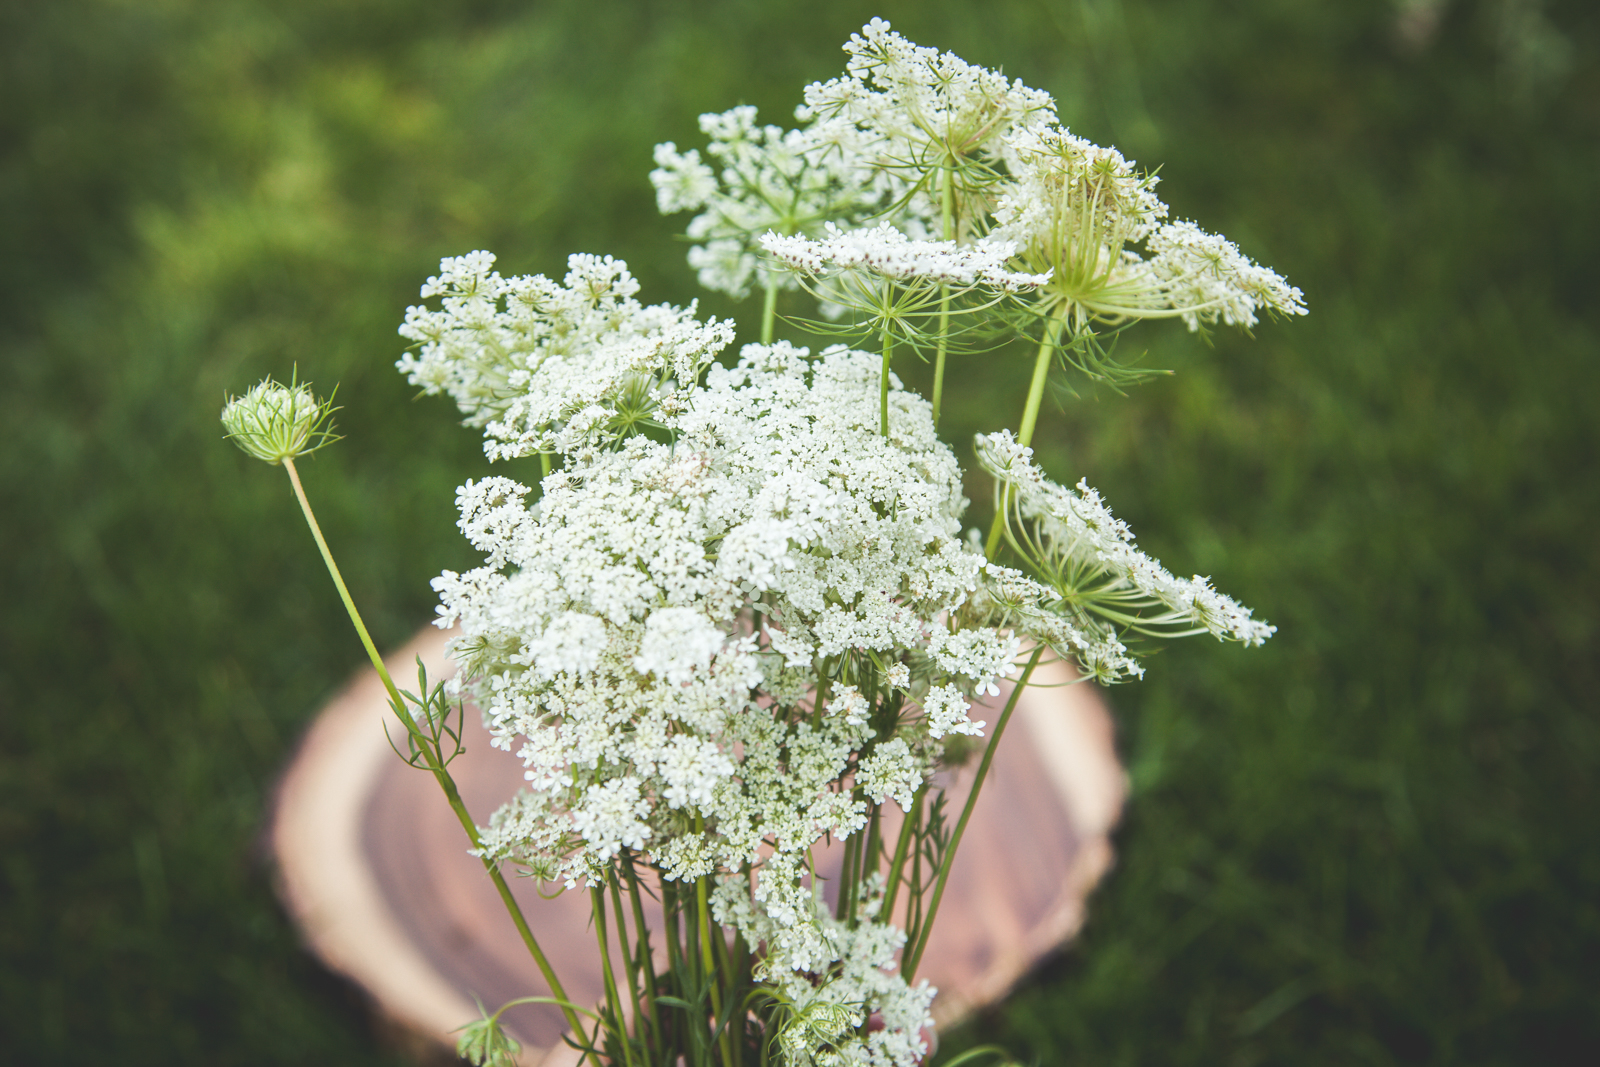 WildflowersPart2-sm-0502.jpg